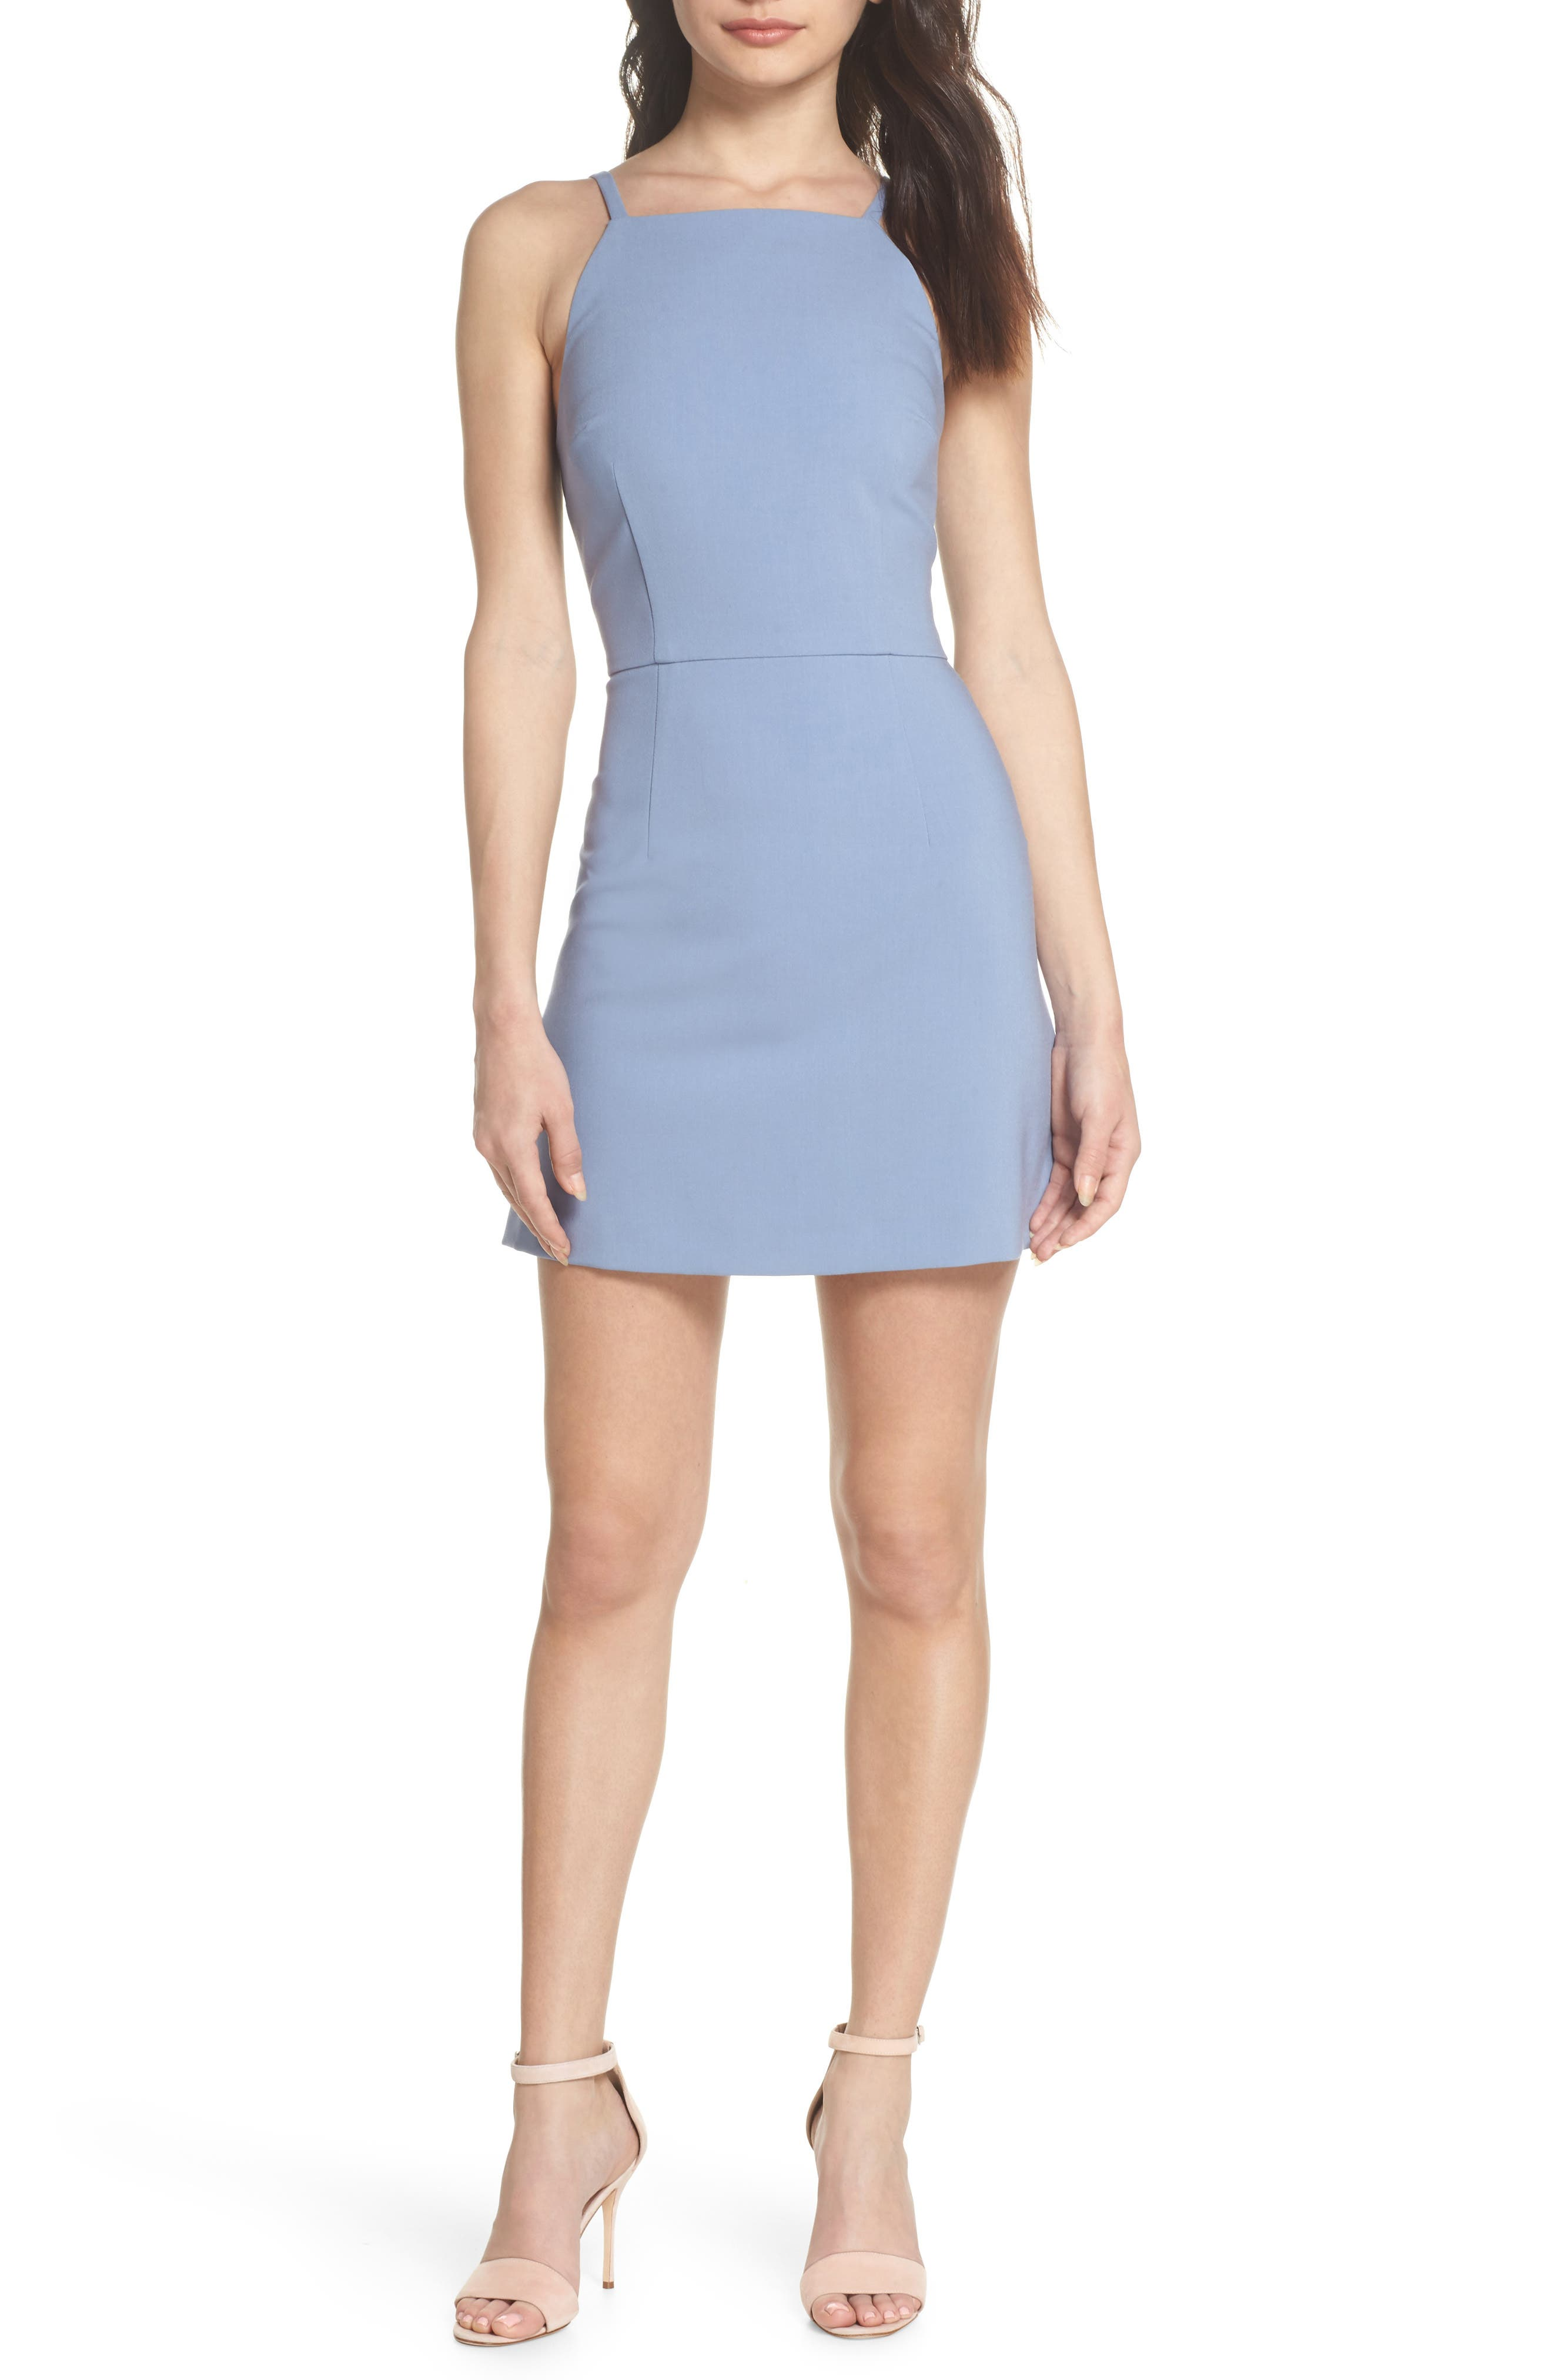 French Connection Whisper Light Sheath Minidress, Blue